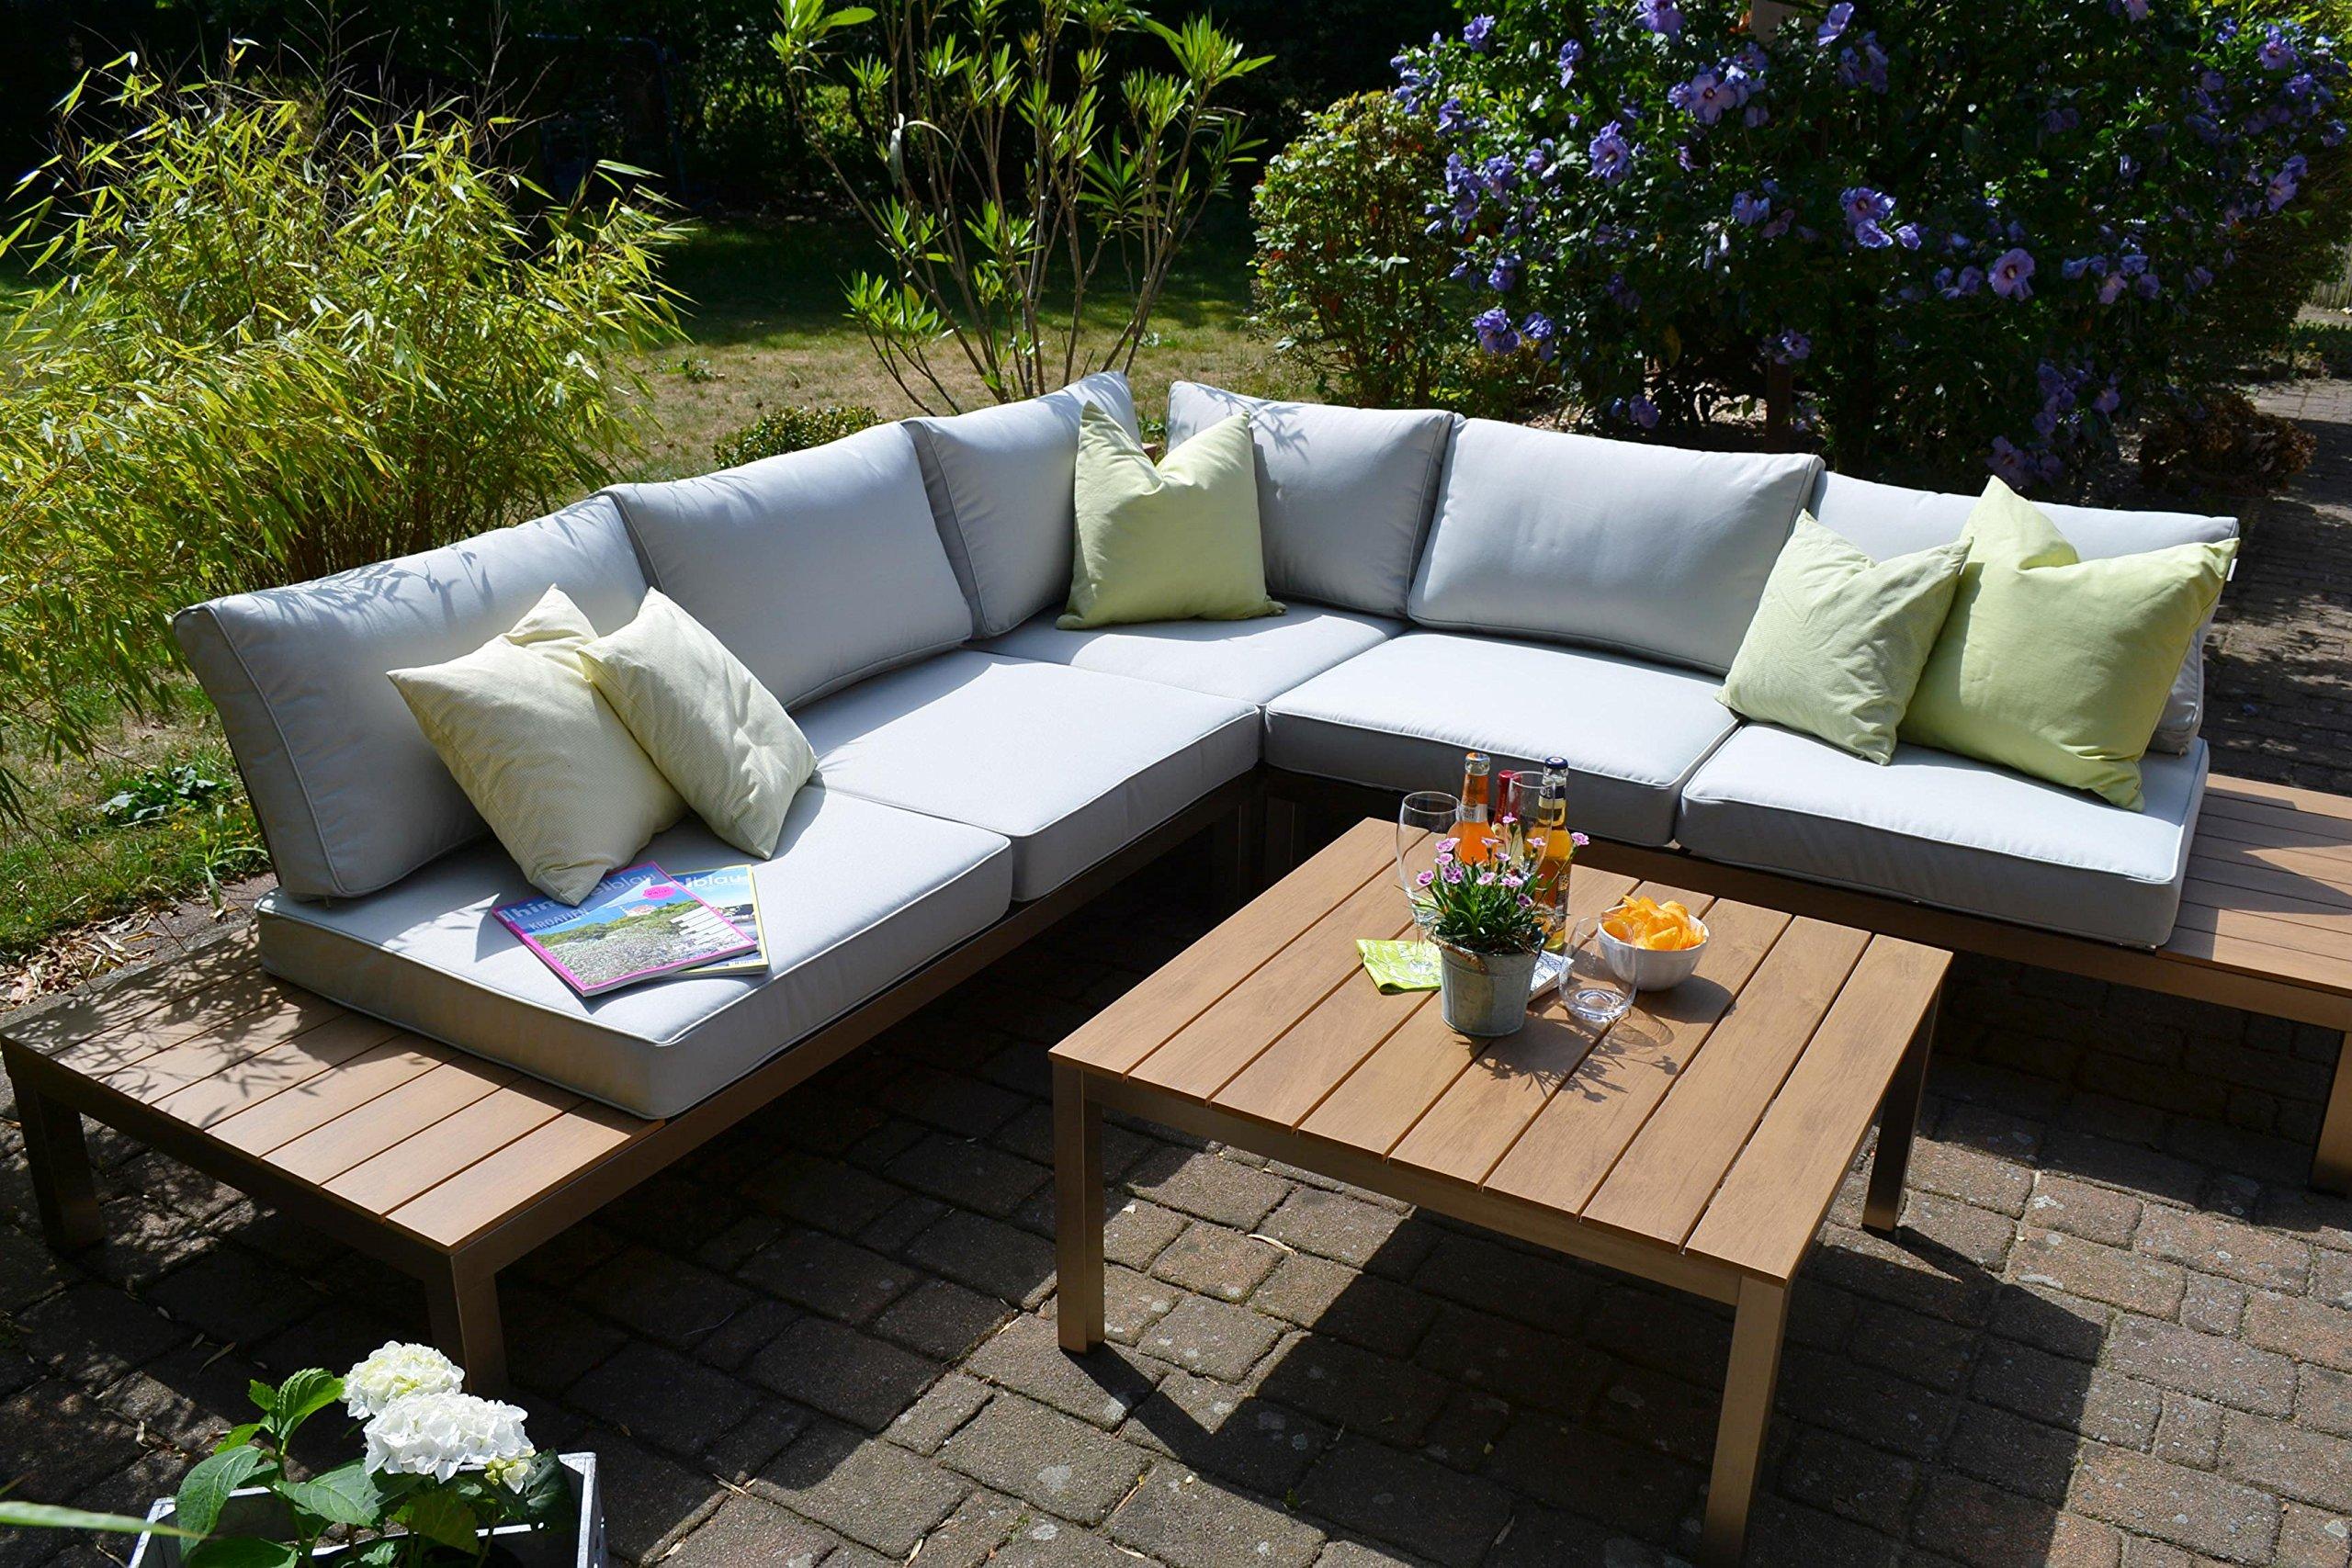 Bomey Aluminium Lounge Set I Gartenmobel Set Orlando 2 Teilig I Edelstahlbeschichtete Essgarnitur I Sitzgruppe Im Teak Holzdekor Tisch Polster I